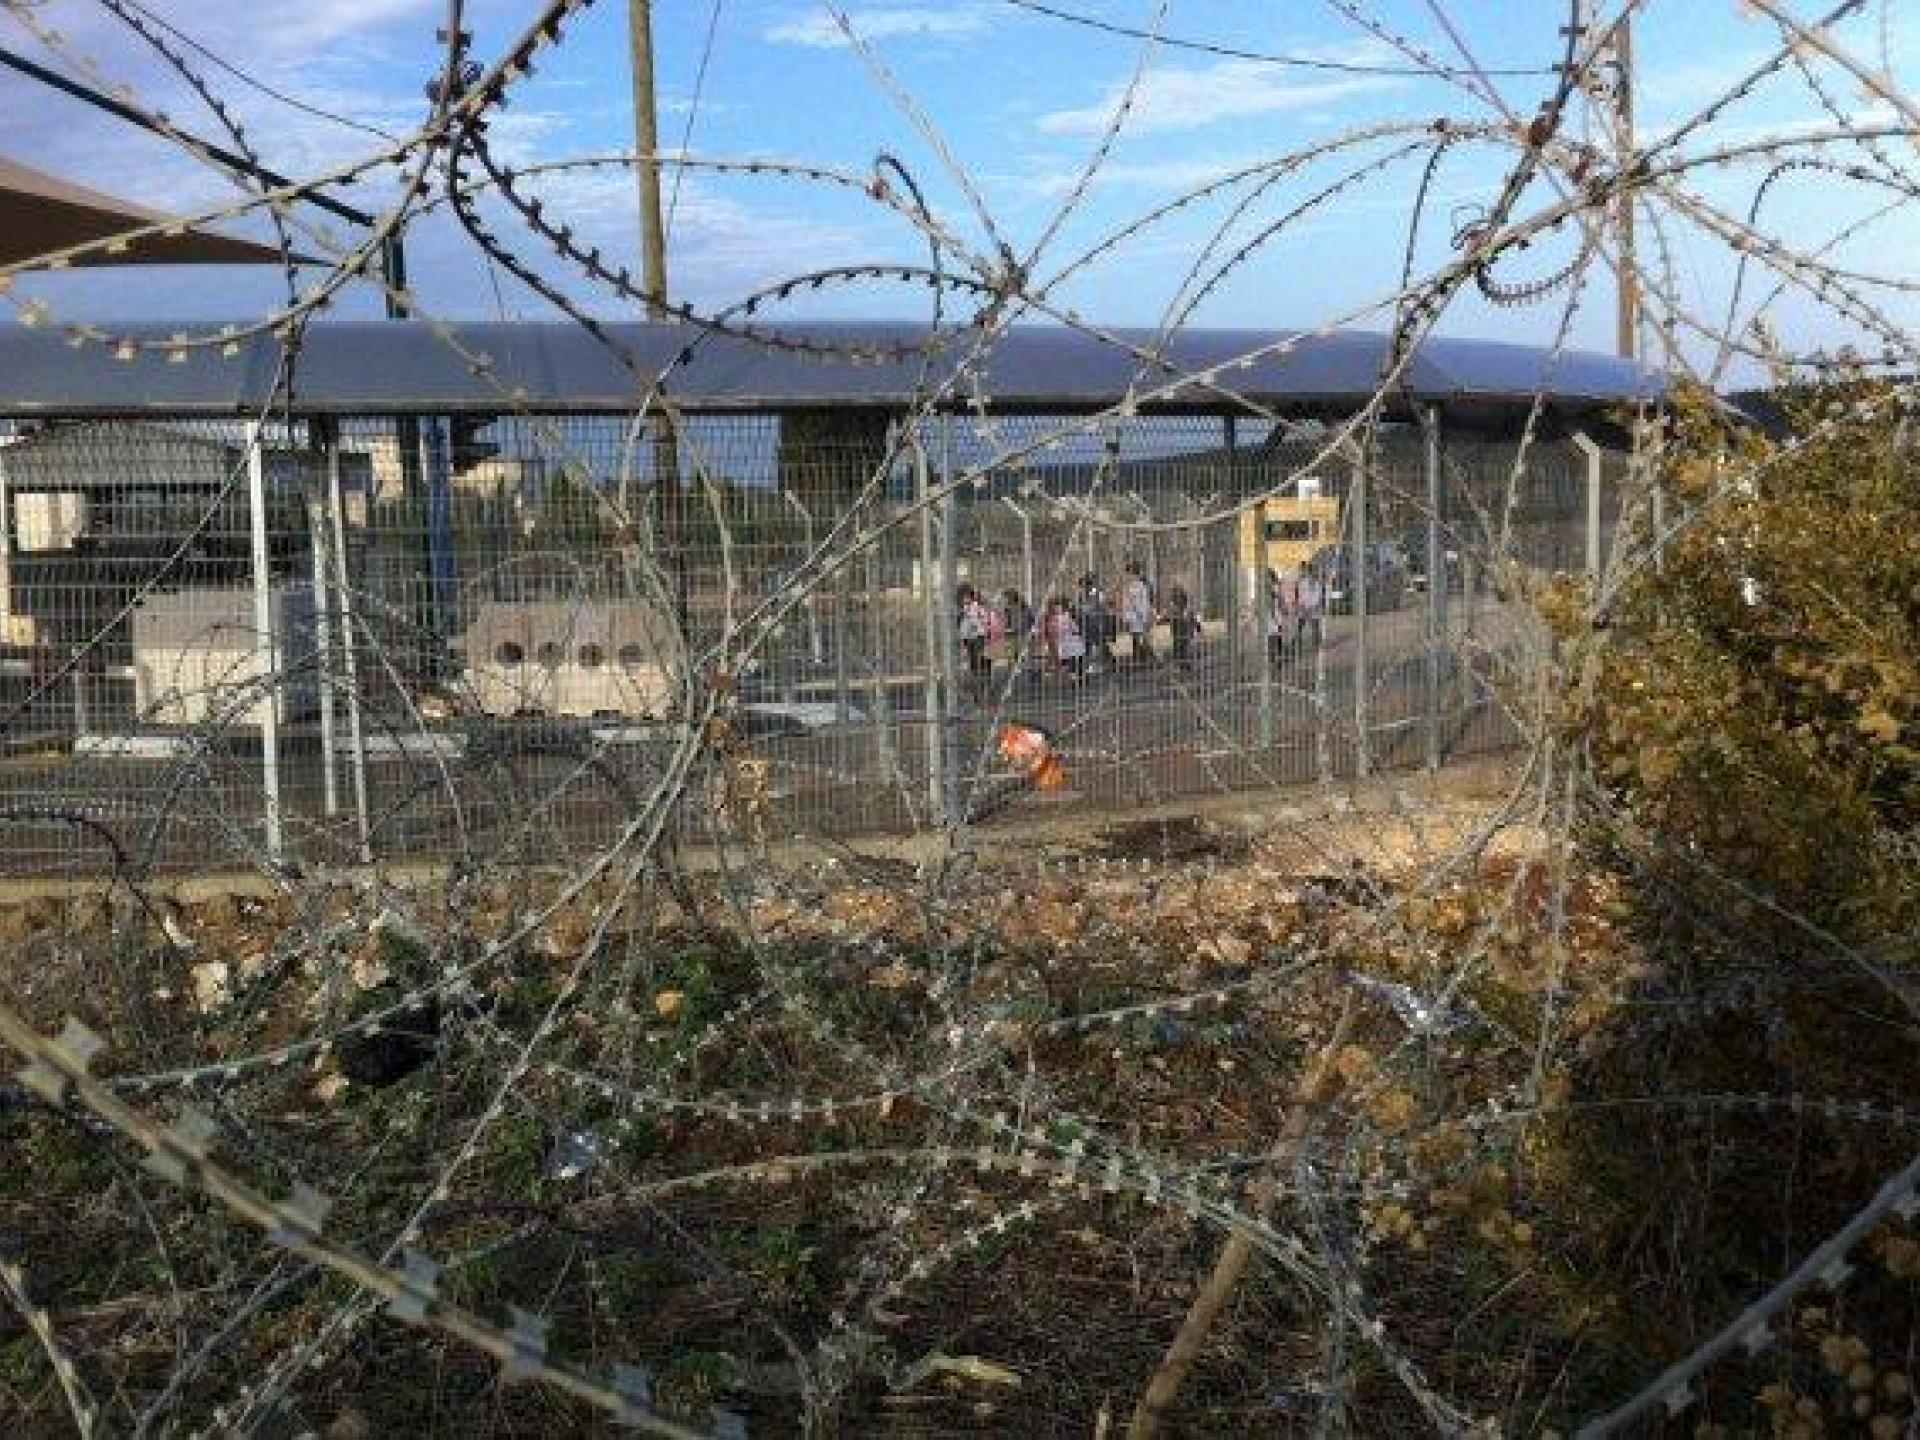 Tura/Shaked checkpoint 04.11.12